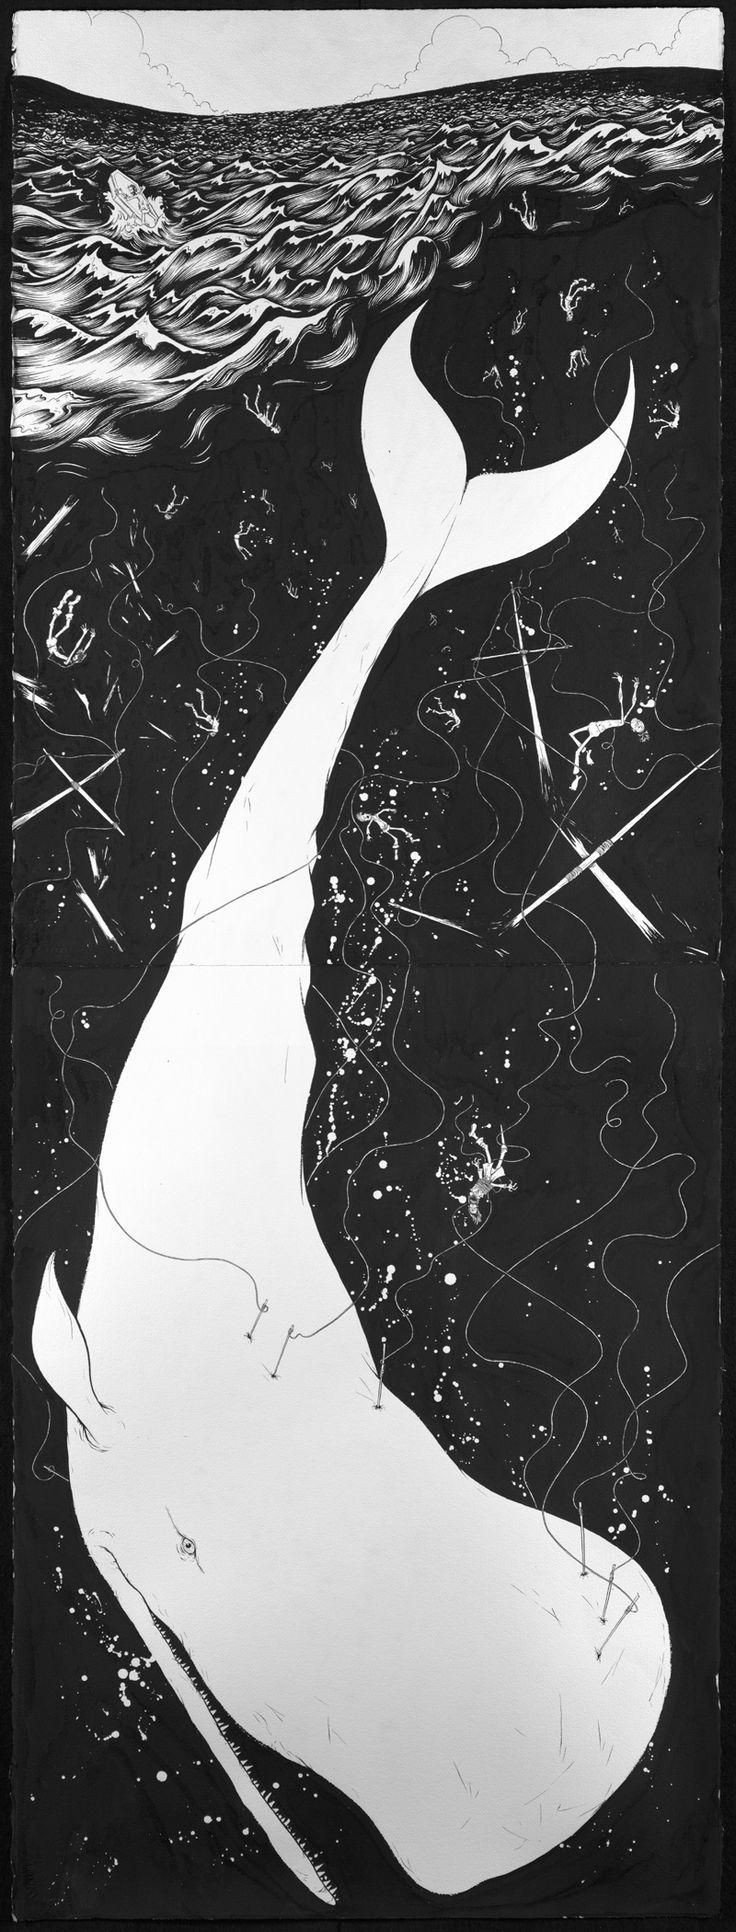 http://ephemerist.wordpress.com/2009/02/06/whale-songs/moby_dick_1/